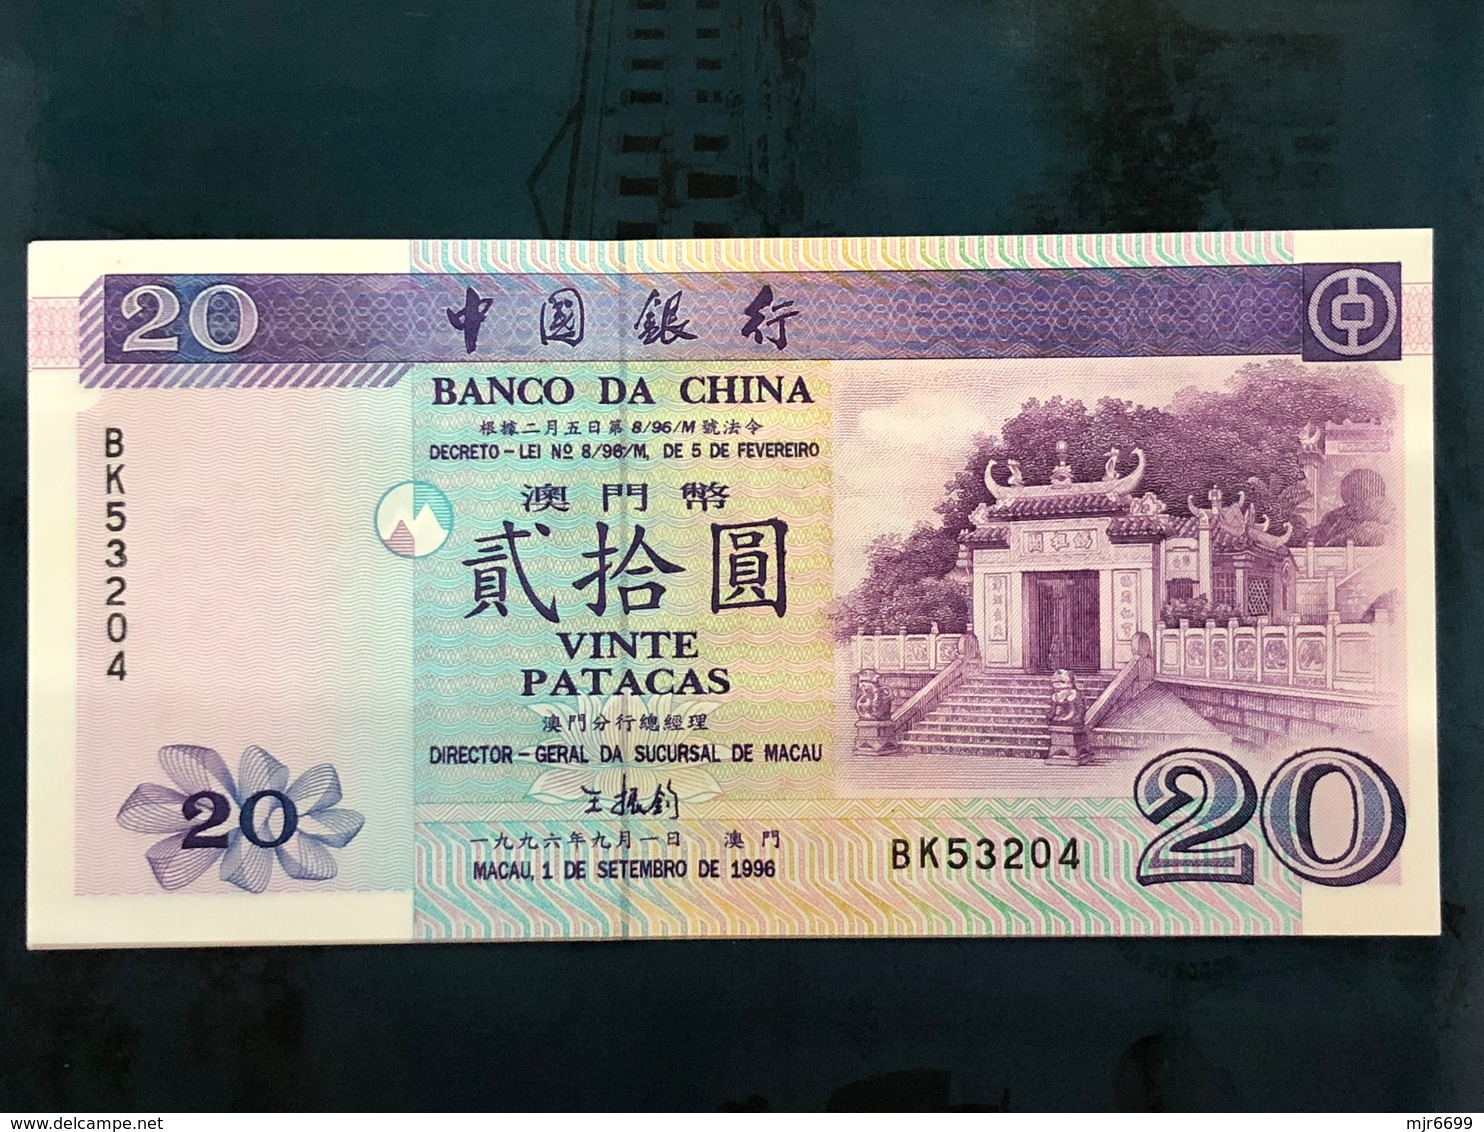 BOC / BANK OF CHINA 1996, 20 PATACAS UNC - Macao